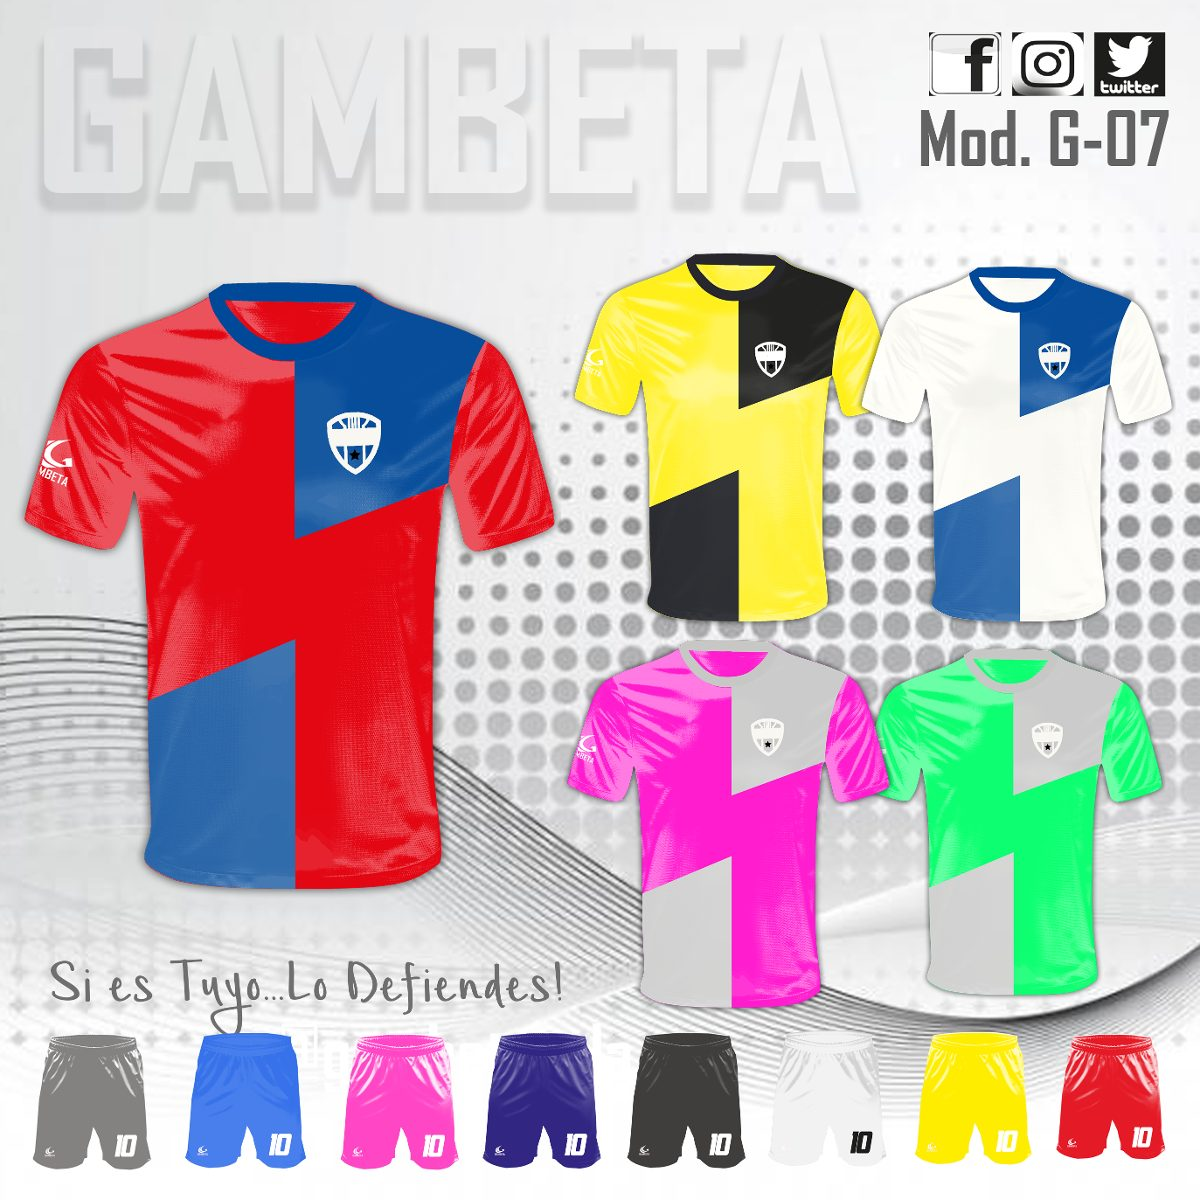 fe11fc67a7a0d uniformes futbol futsal deportivos. Cargando zoom.